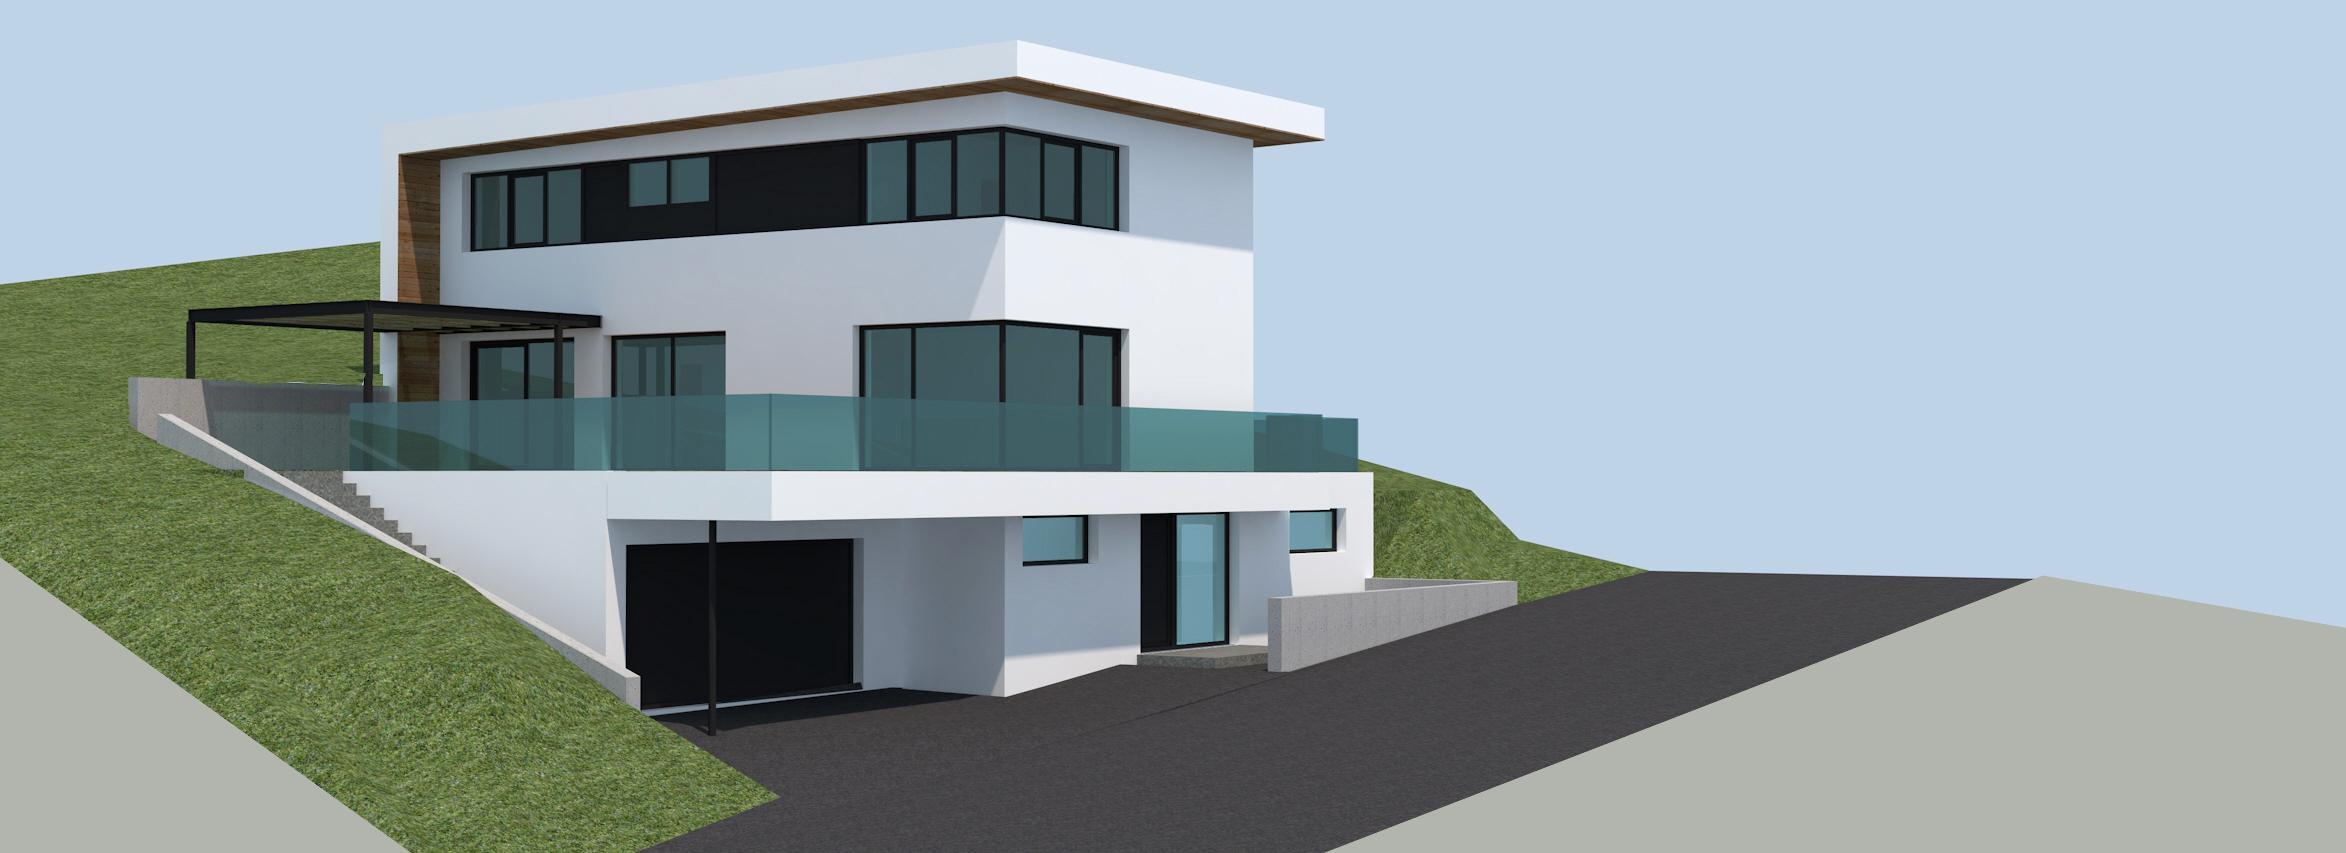 Wohnhaus MJE |  Imst